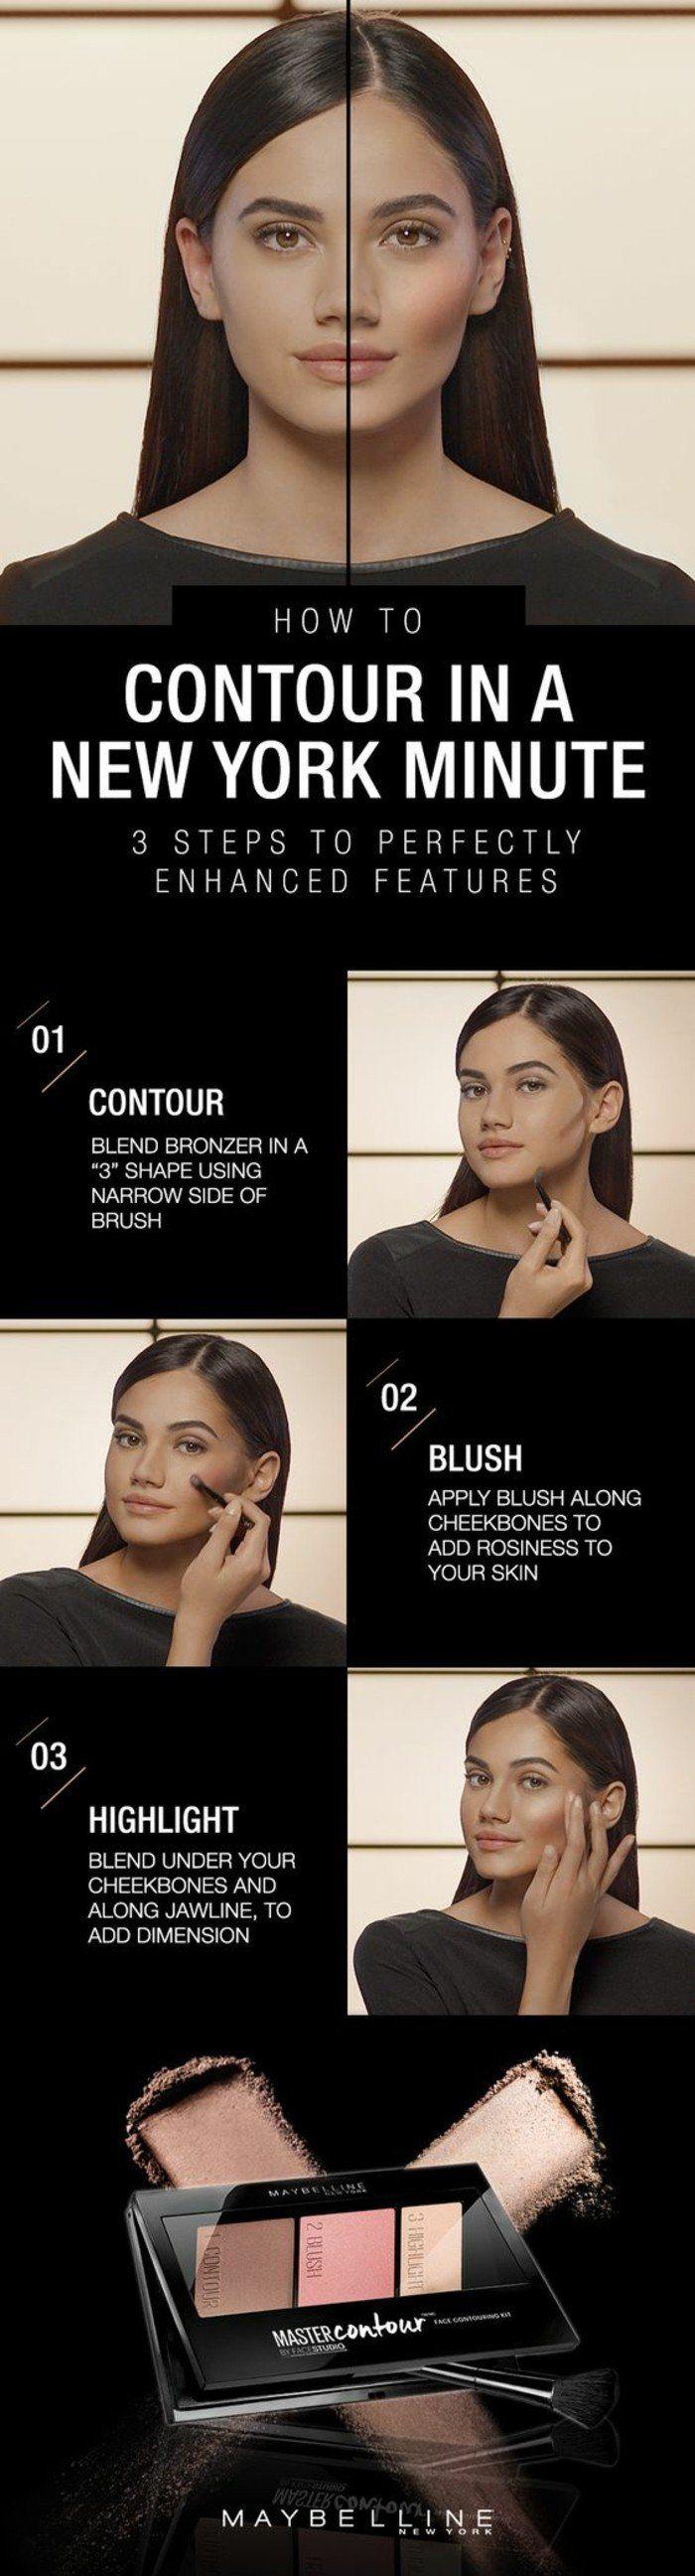 maybeline conseil tuto, maquillage naturel brunette proposé par maybeline